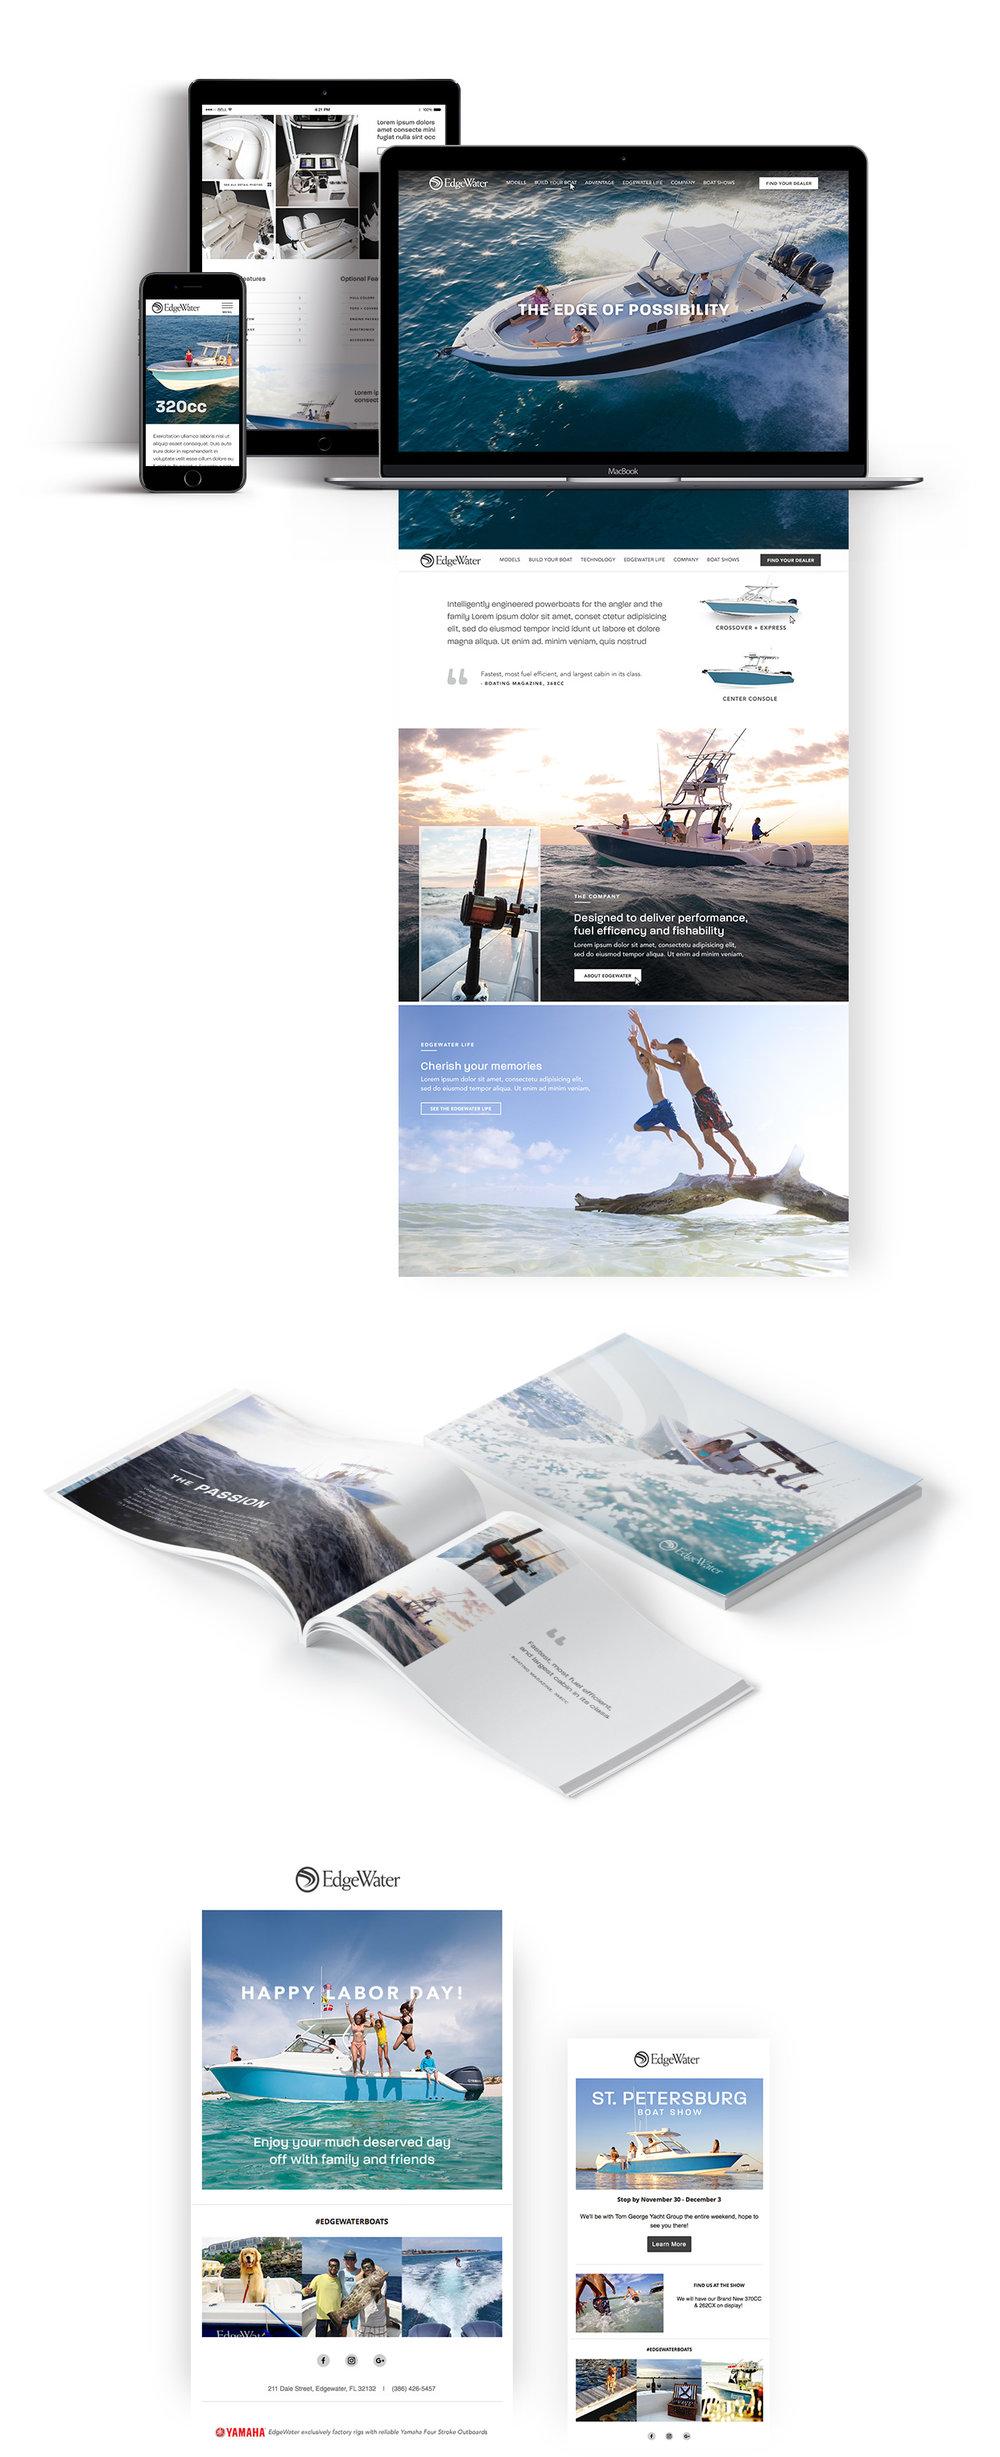 edgewater boats advertising splash creatives